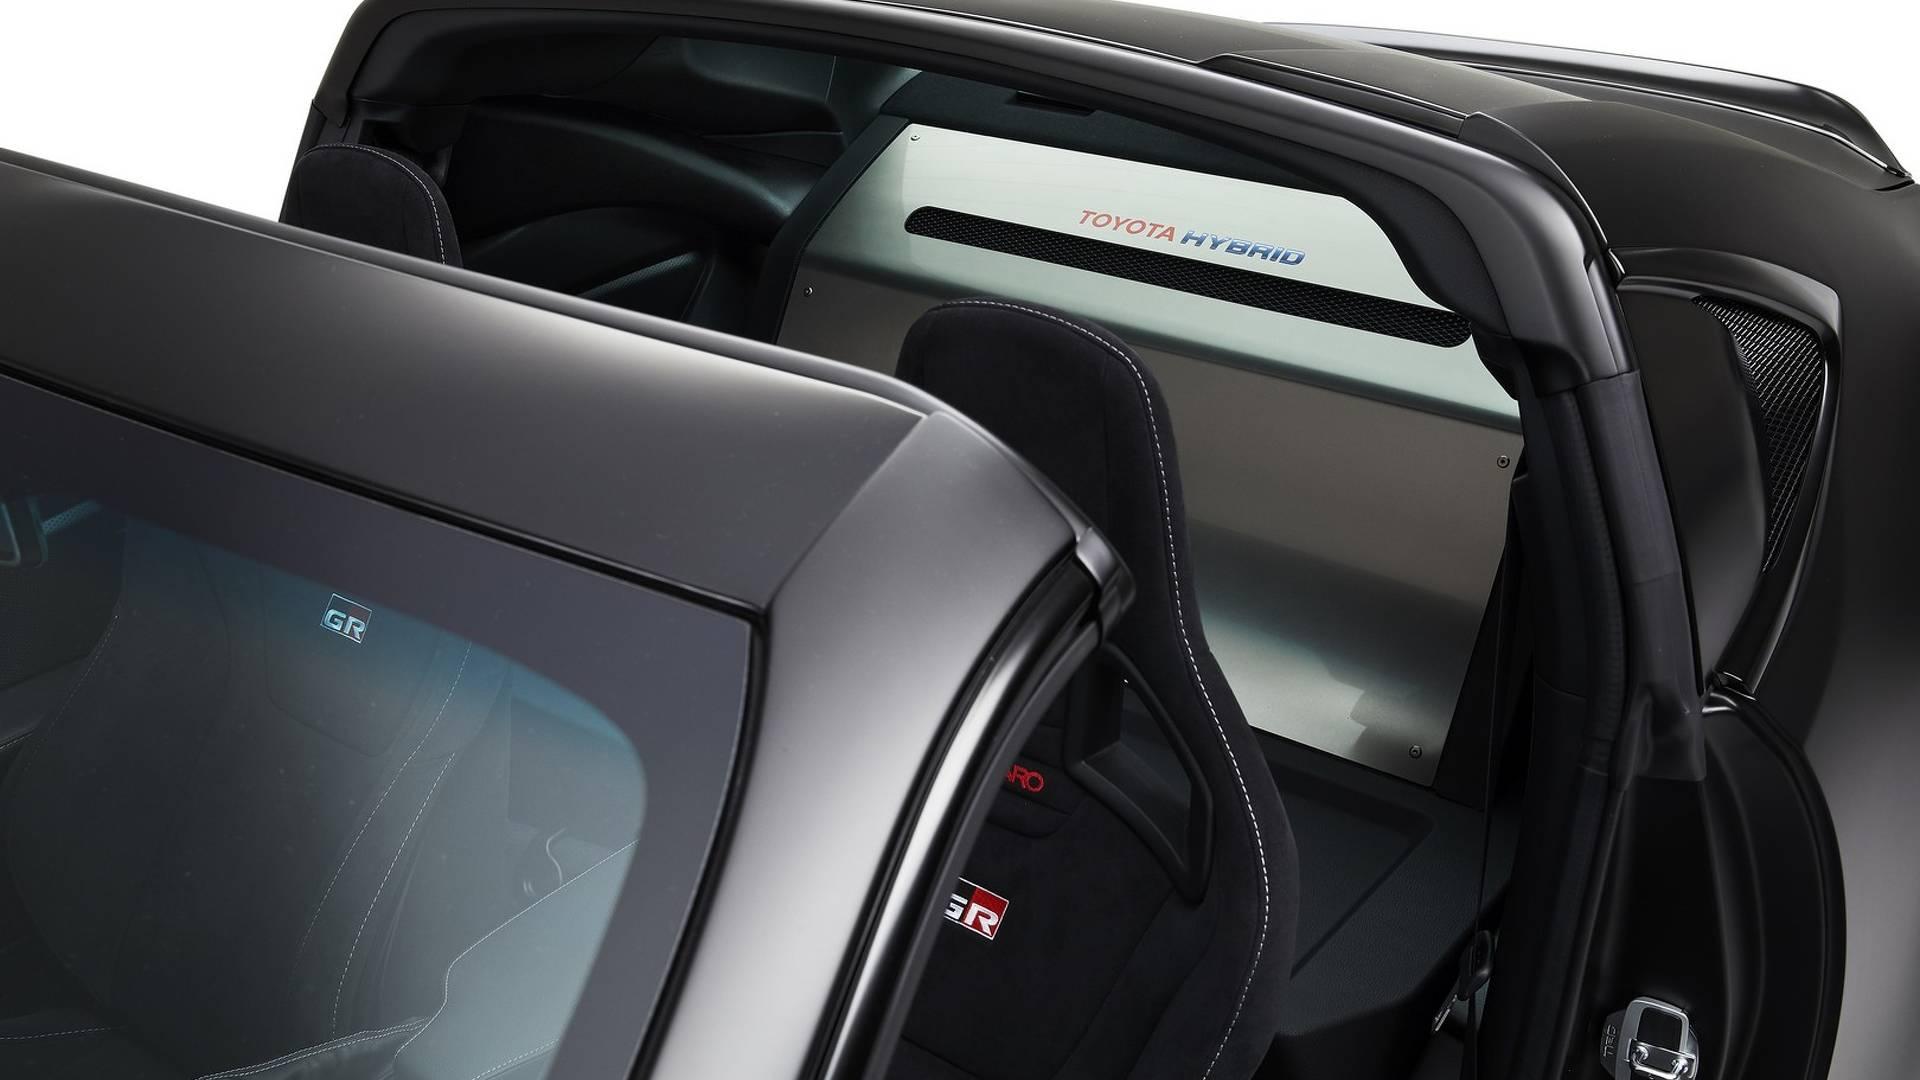 Toyota Ts050 Hybrid Lmp1 Prototype Enters The 2016 World